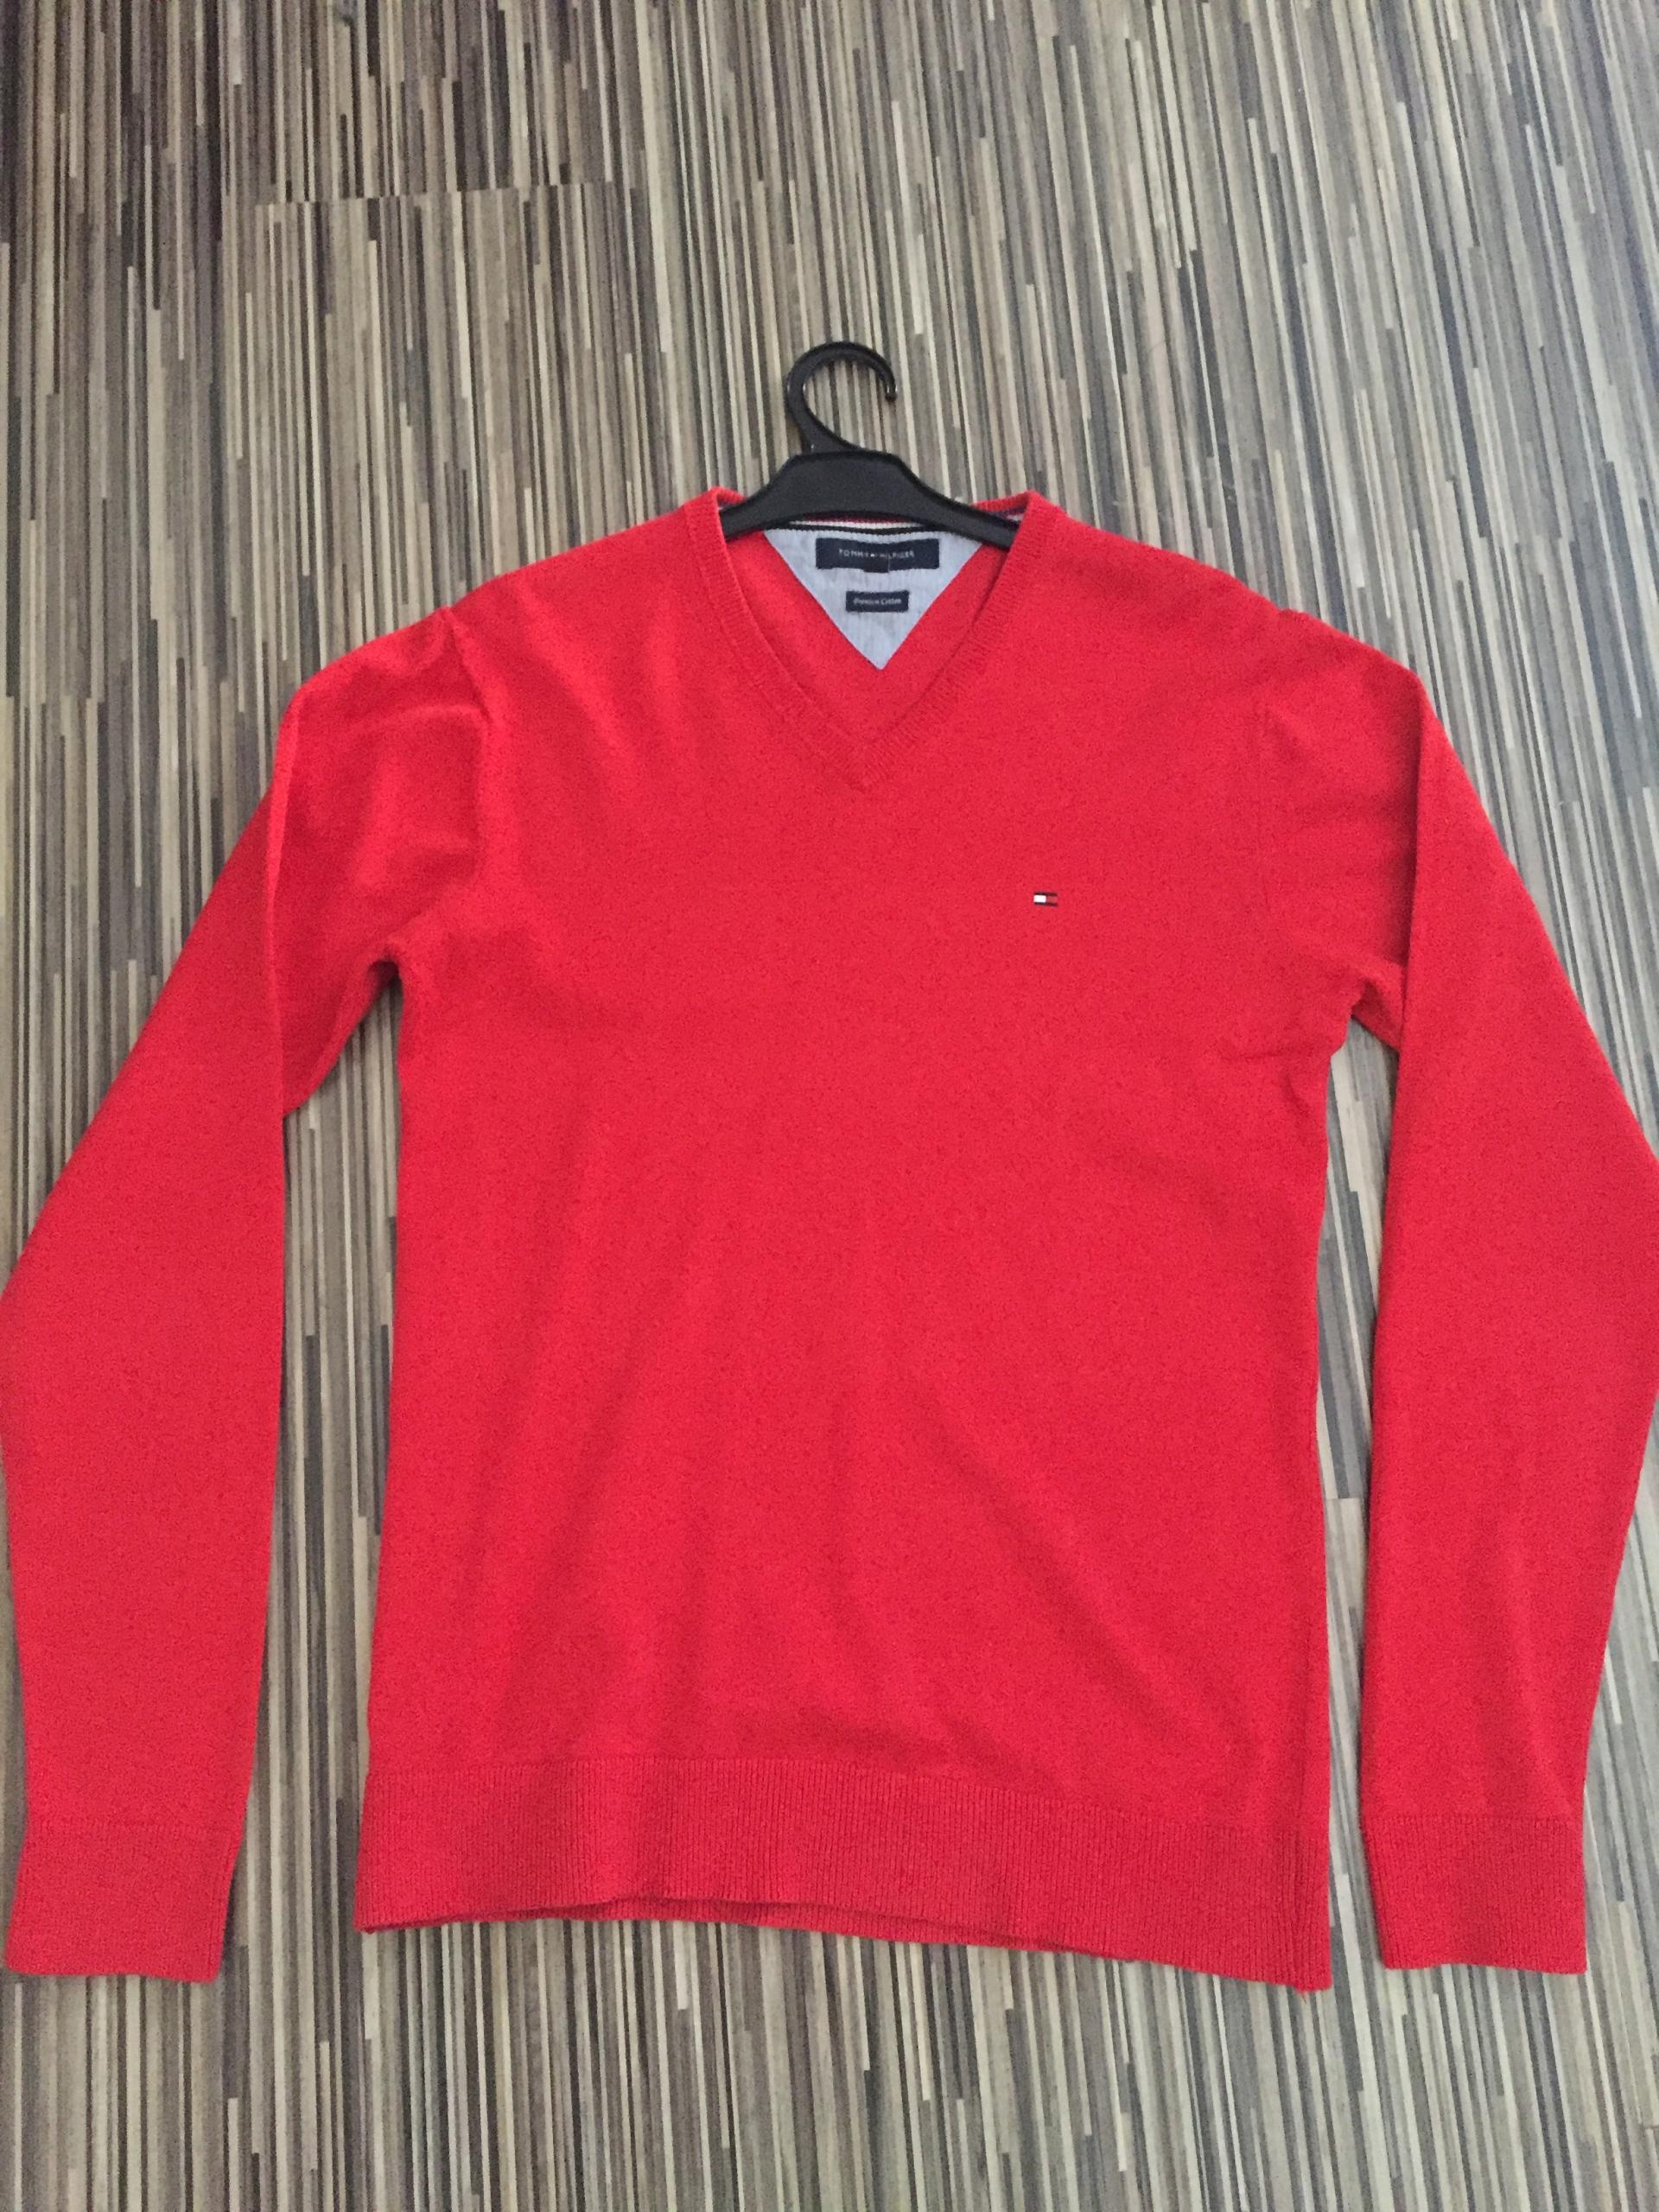 MEGA PAKA męskich ubrań markowe Tommy ZARA peak